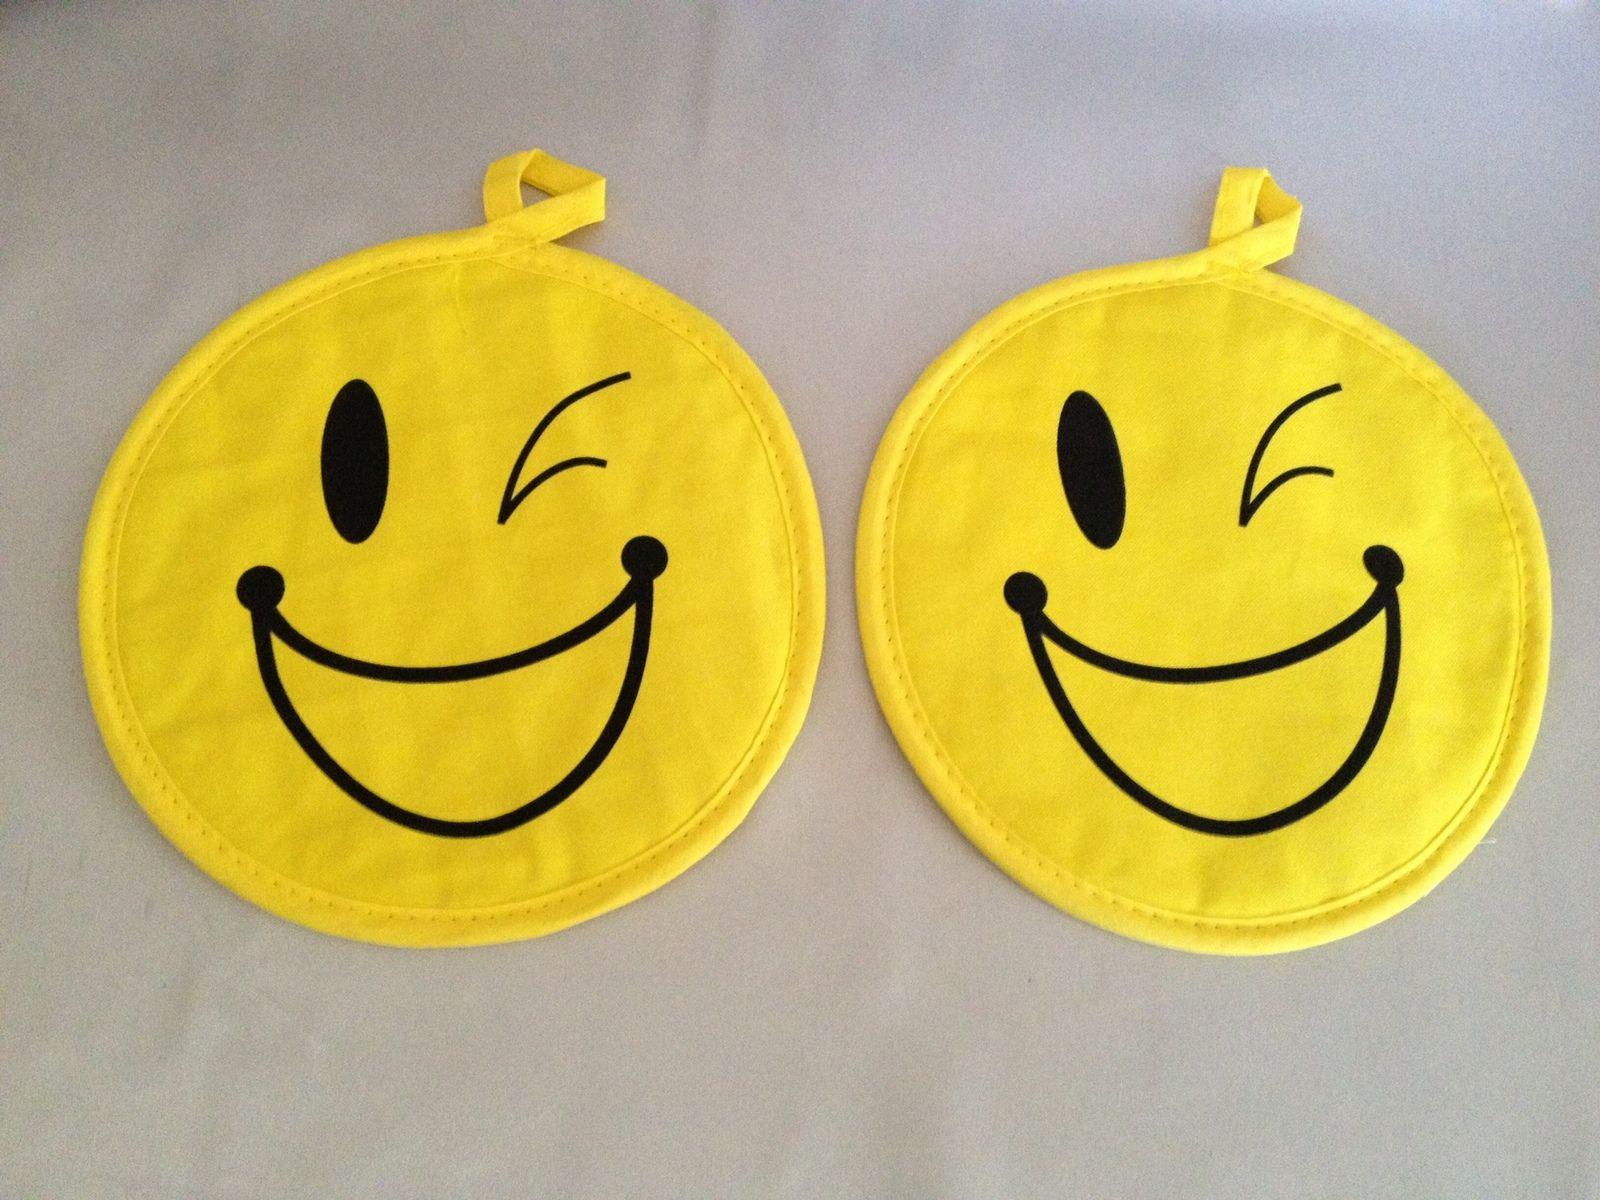 Winking Smiley Face Hot Pads Kitchen Potholder Pair Nwot 100 Cotton Http Www Bonanza Com Listings 301842594 Hot Pads Smiley Yellow Smiley Face